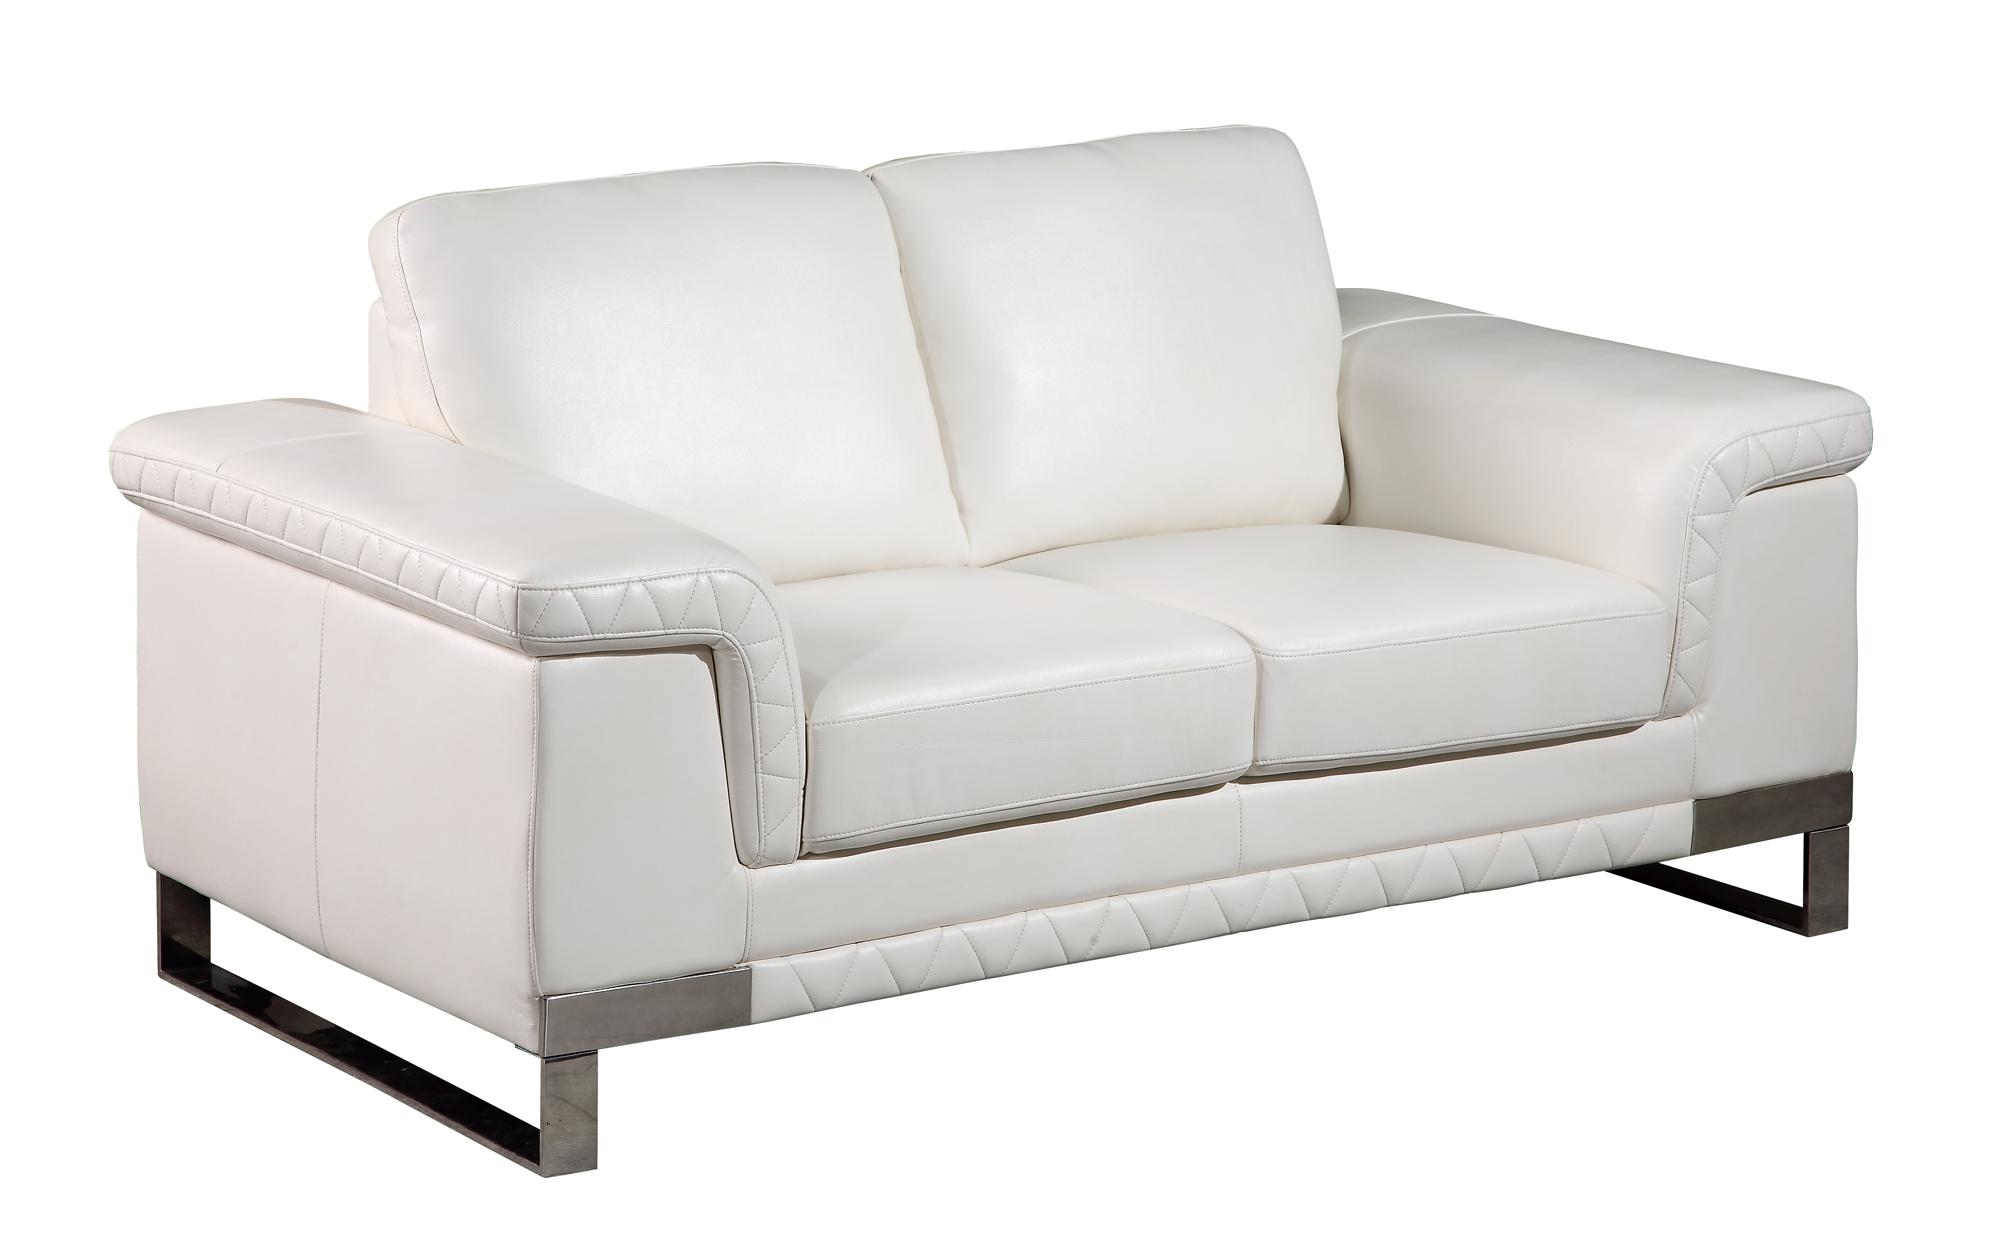 u white leather gel loveseat by global furniture -